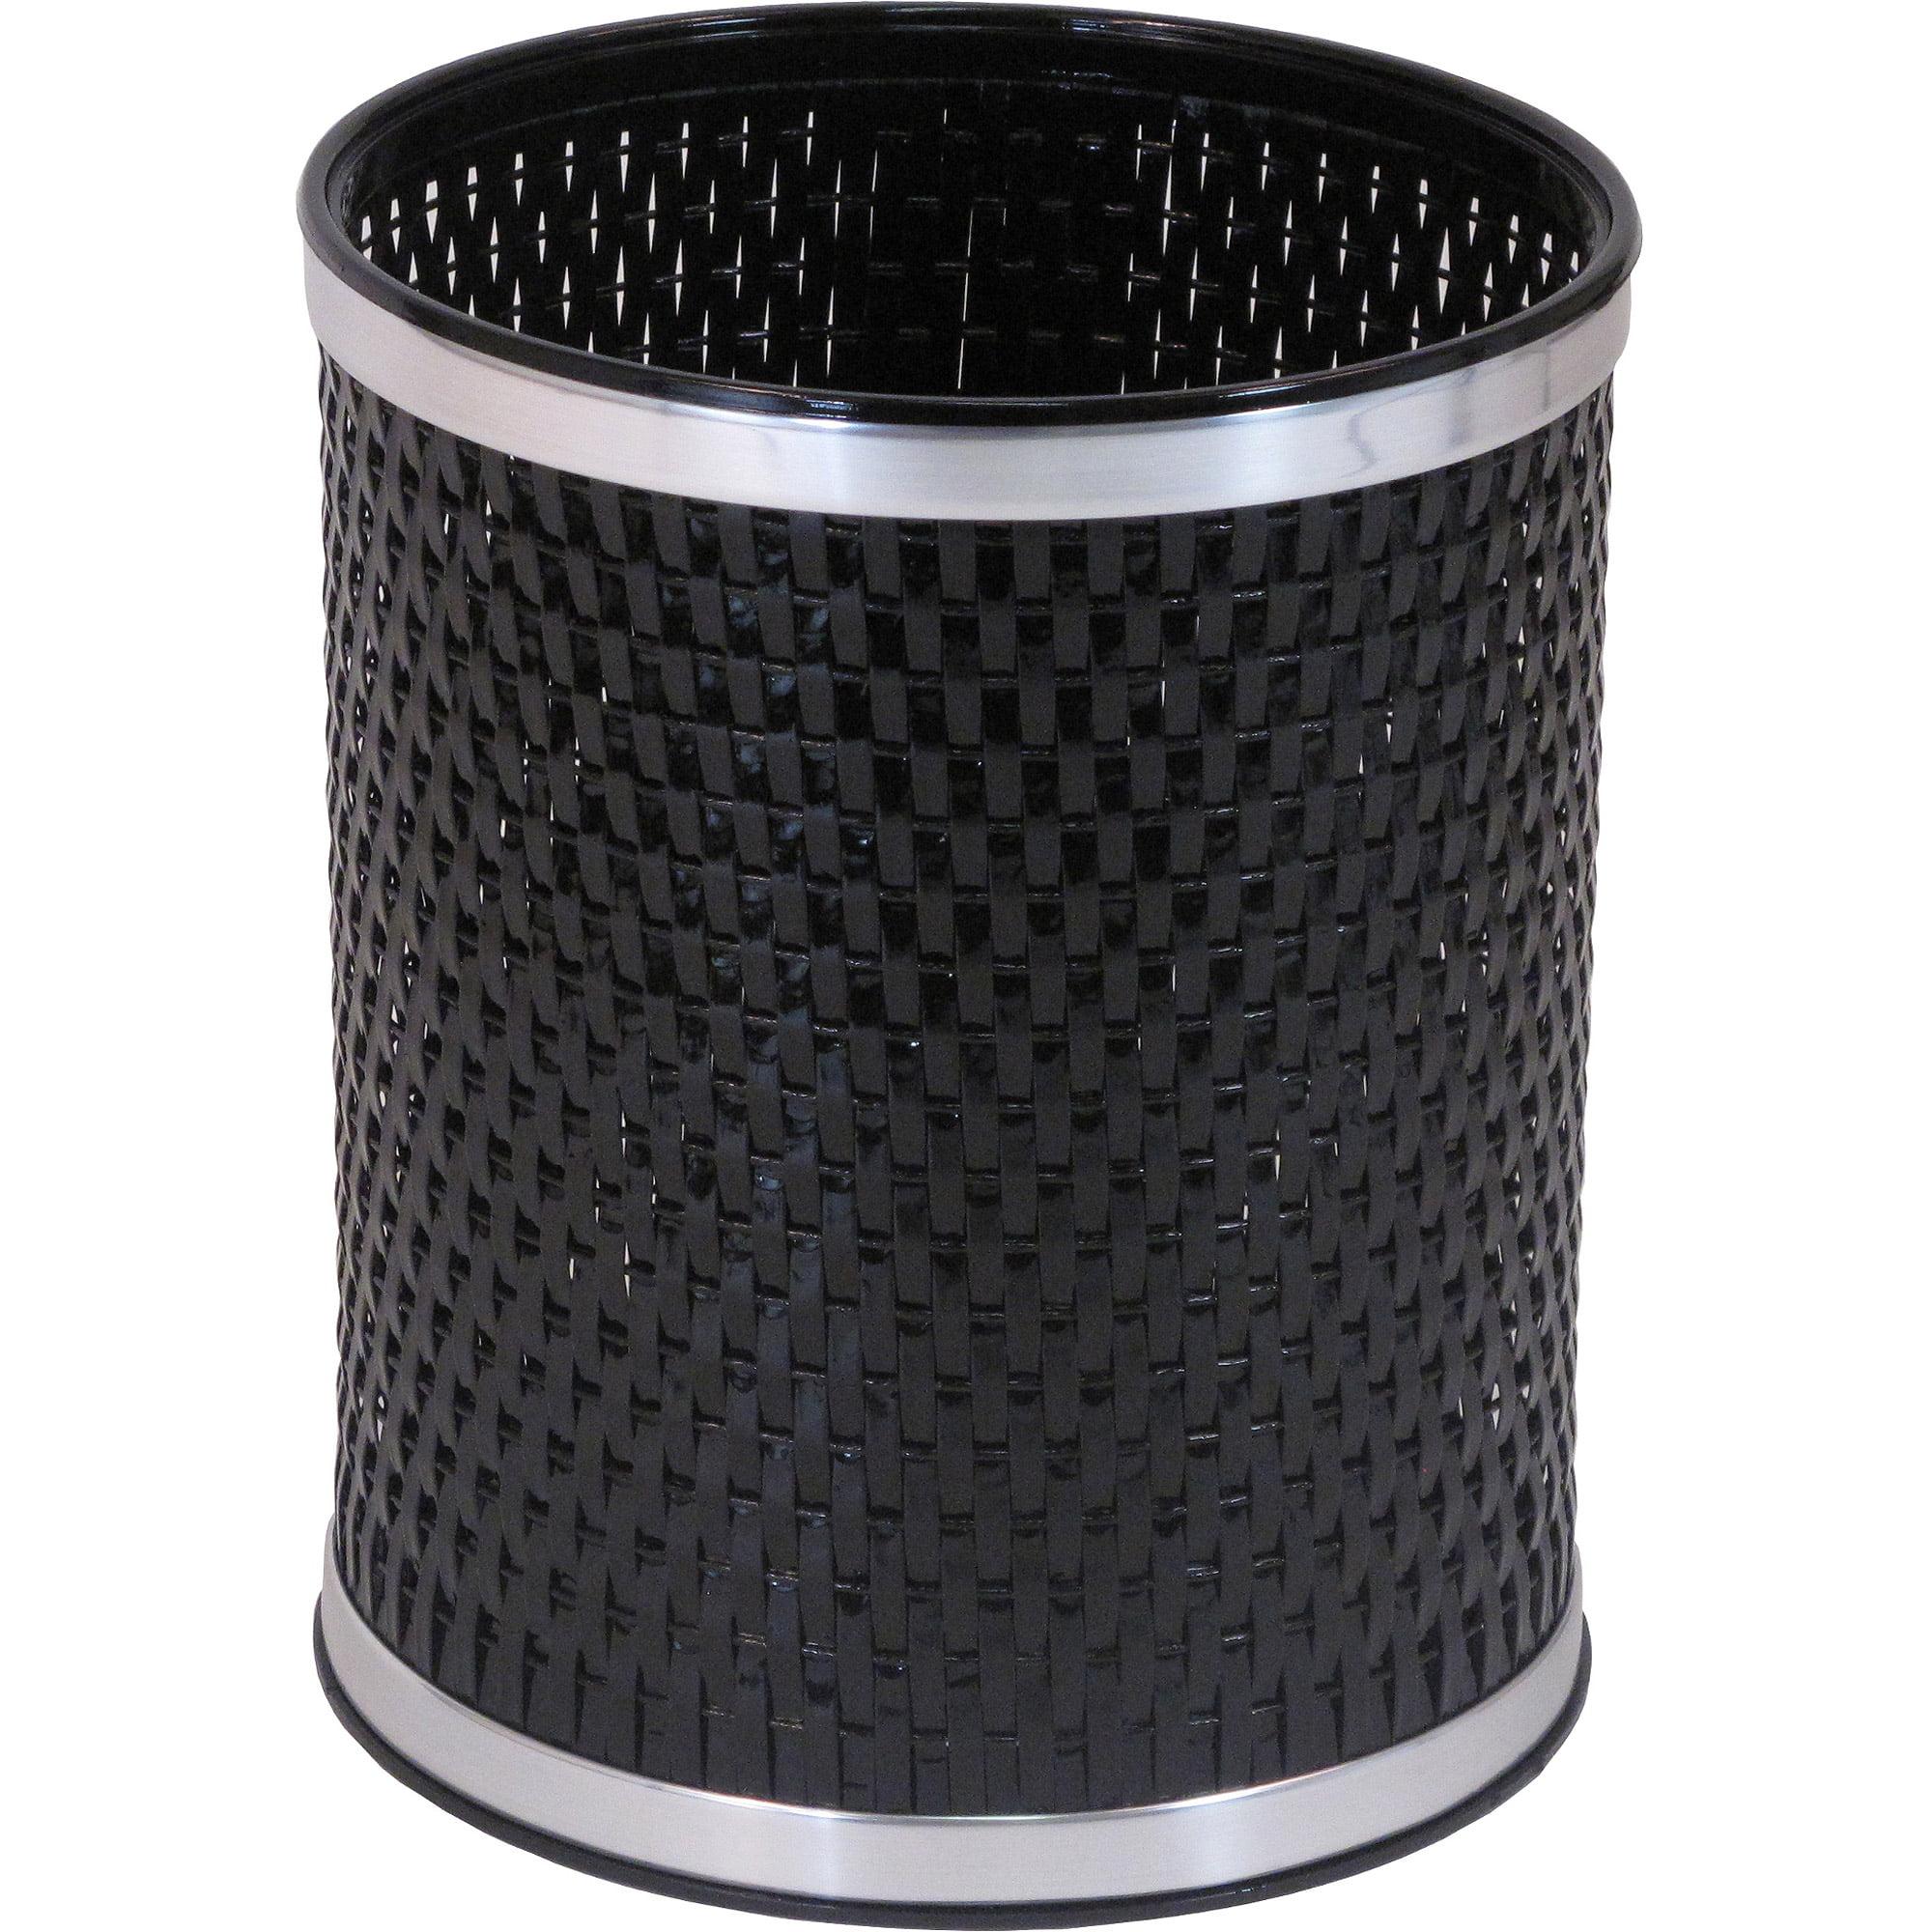 Capri Classic Round Wastebasket